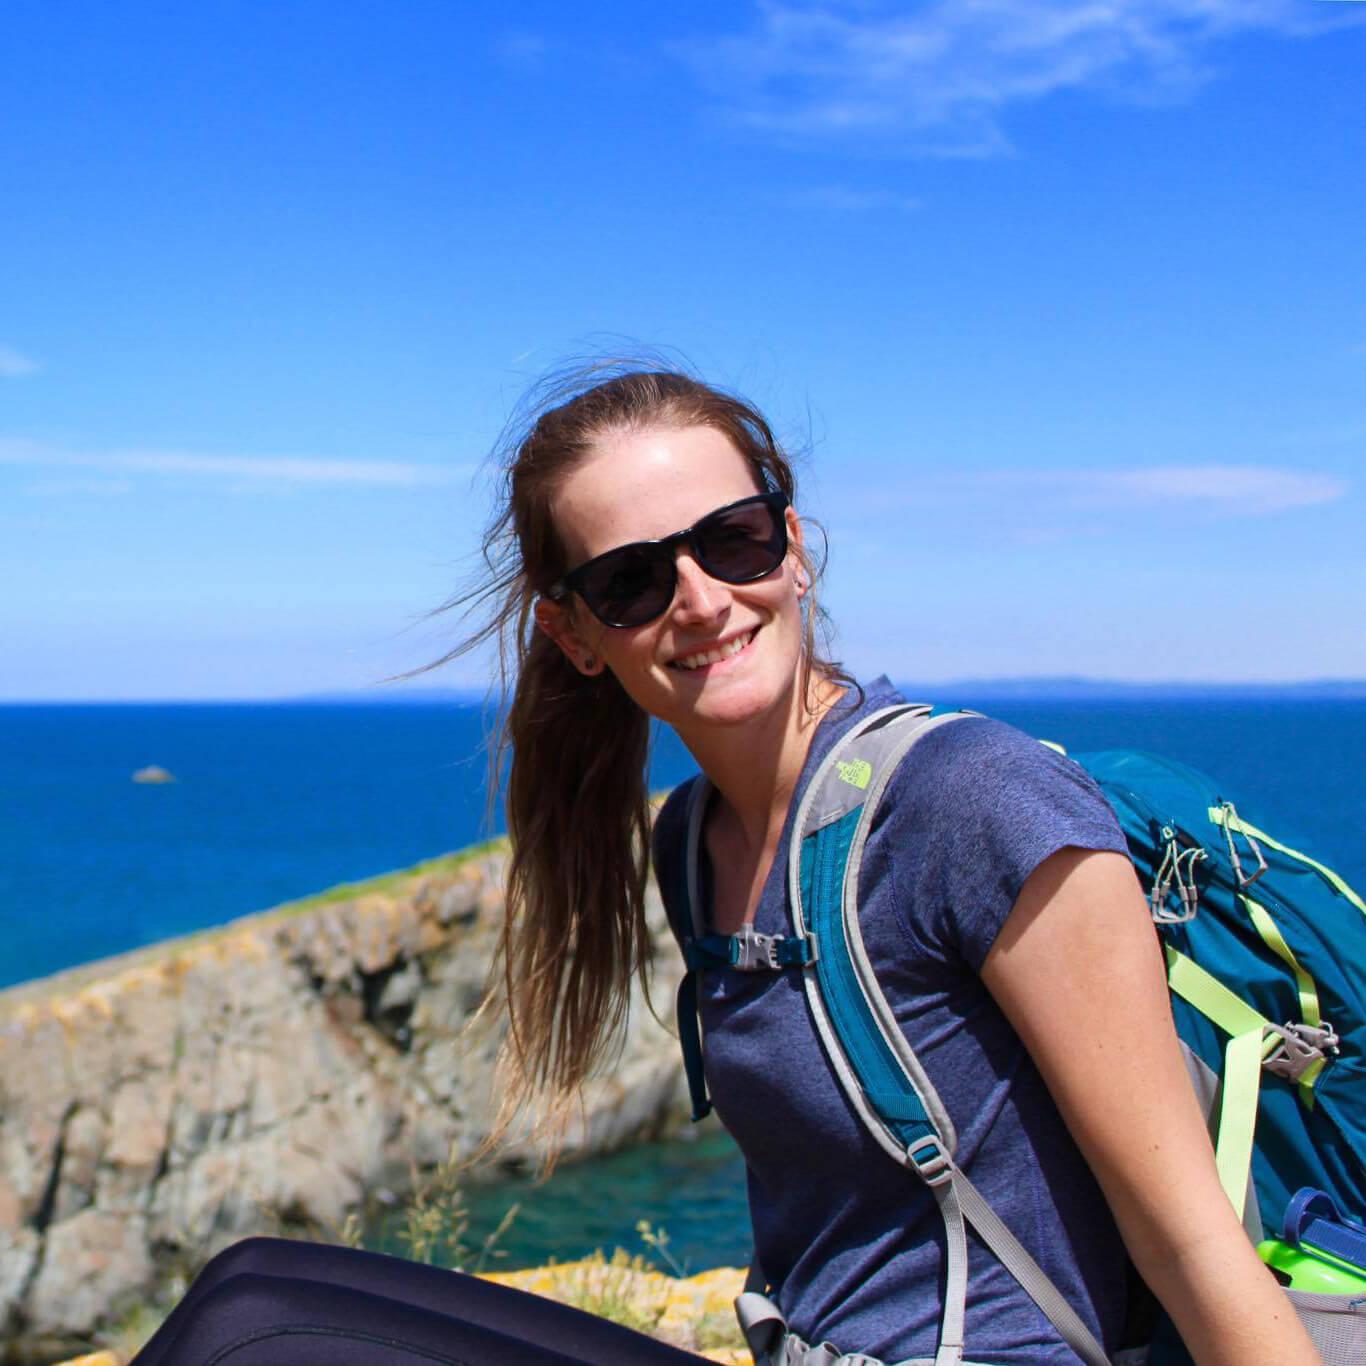 Image profil de notre collaboratrice Marie-Pierre Clark